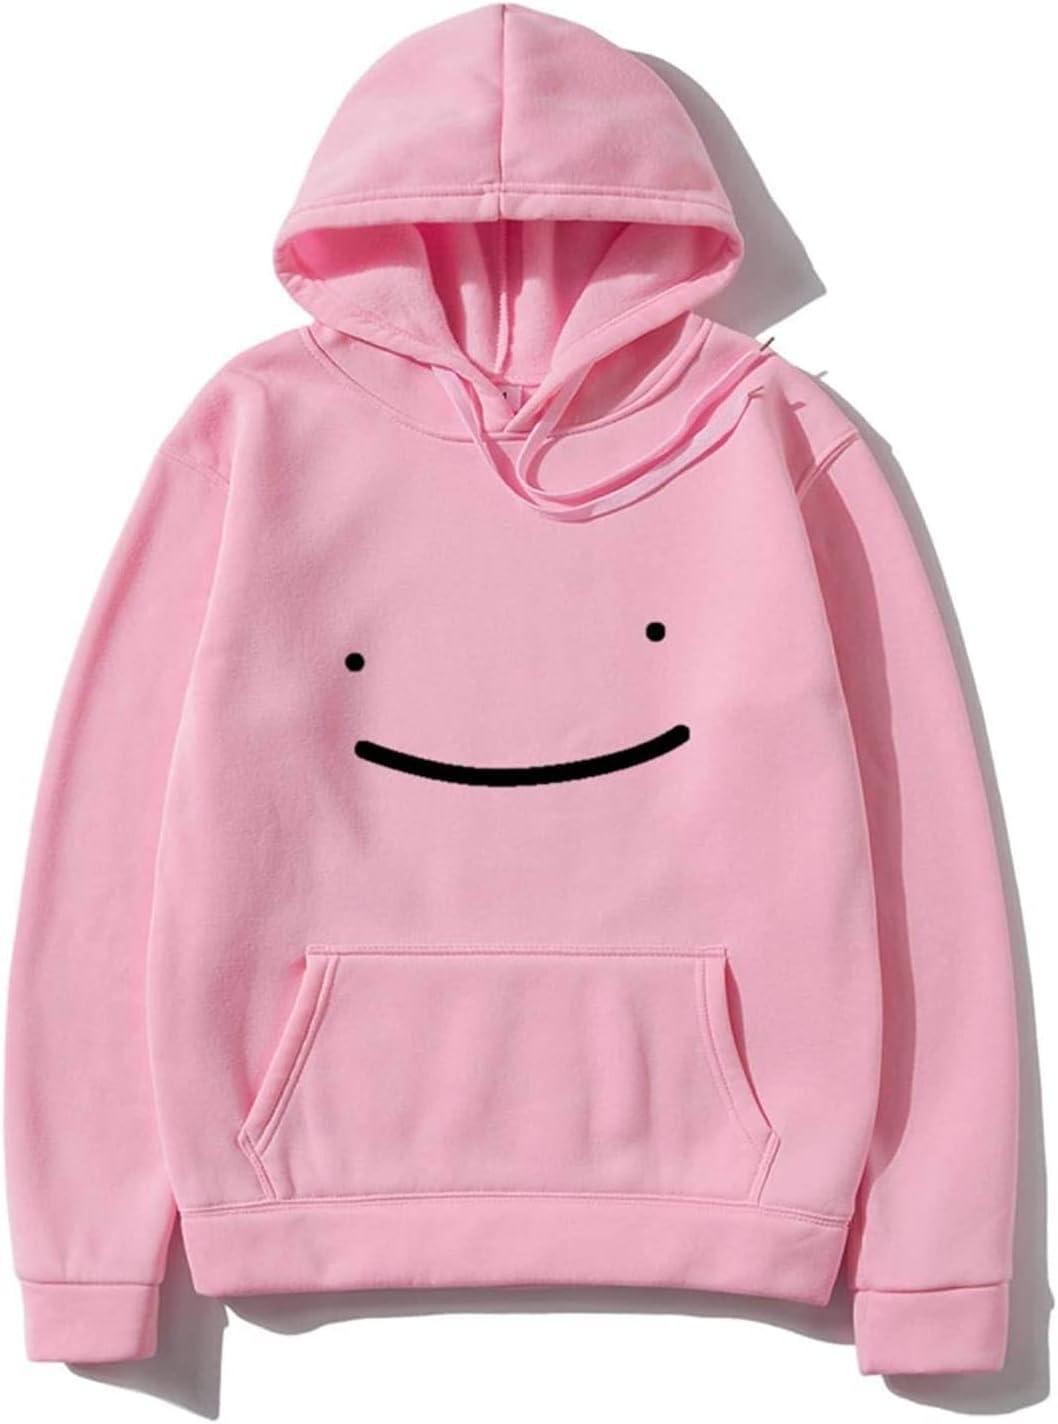 MAORR Cartoon Hooded Sweater, Moletom Com Capuz Moletom Masculino Feminino Harajuku Pullover Moletom Streetwear Moda Casual Roupas Grandes (Color : 20, Size : -XXXL)